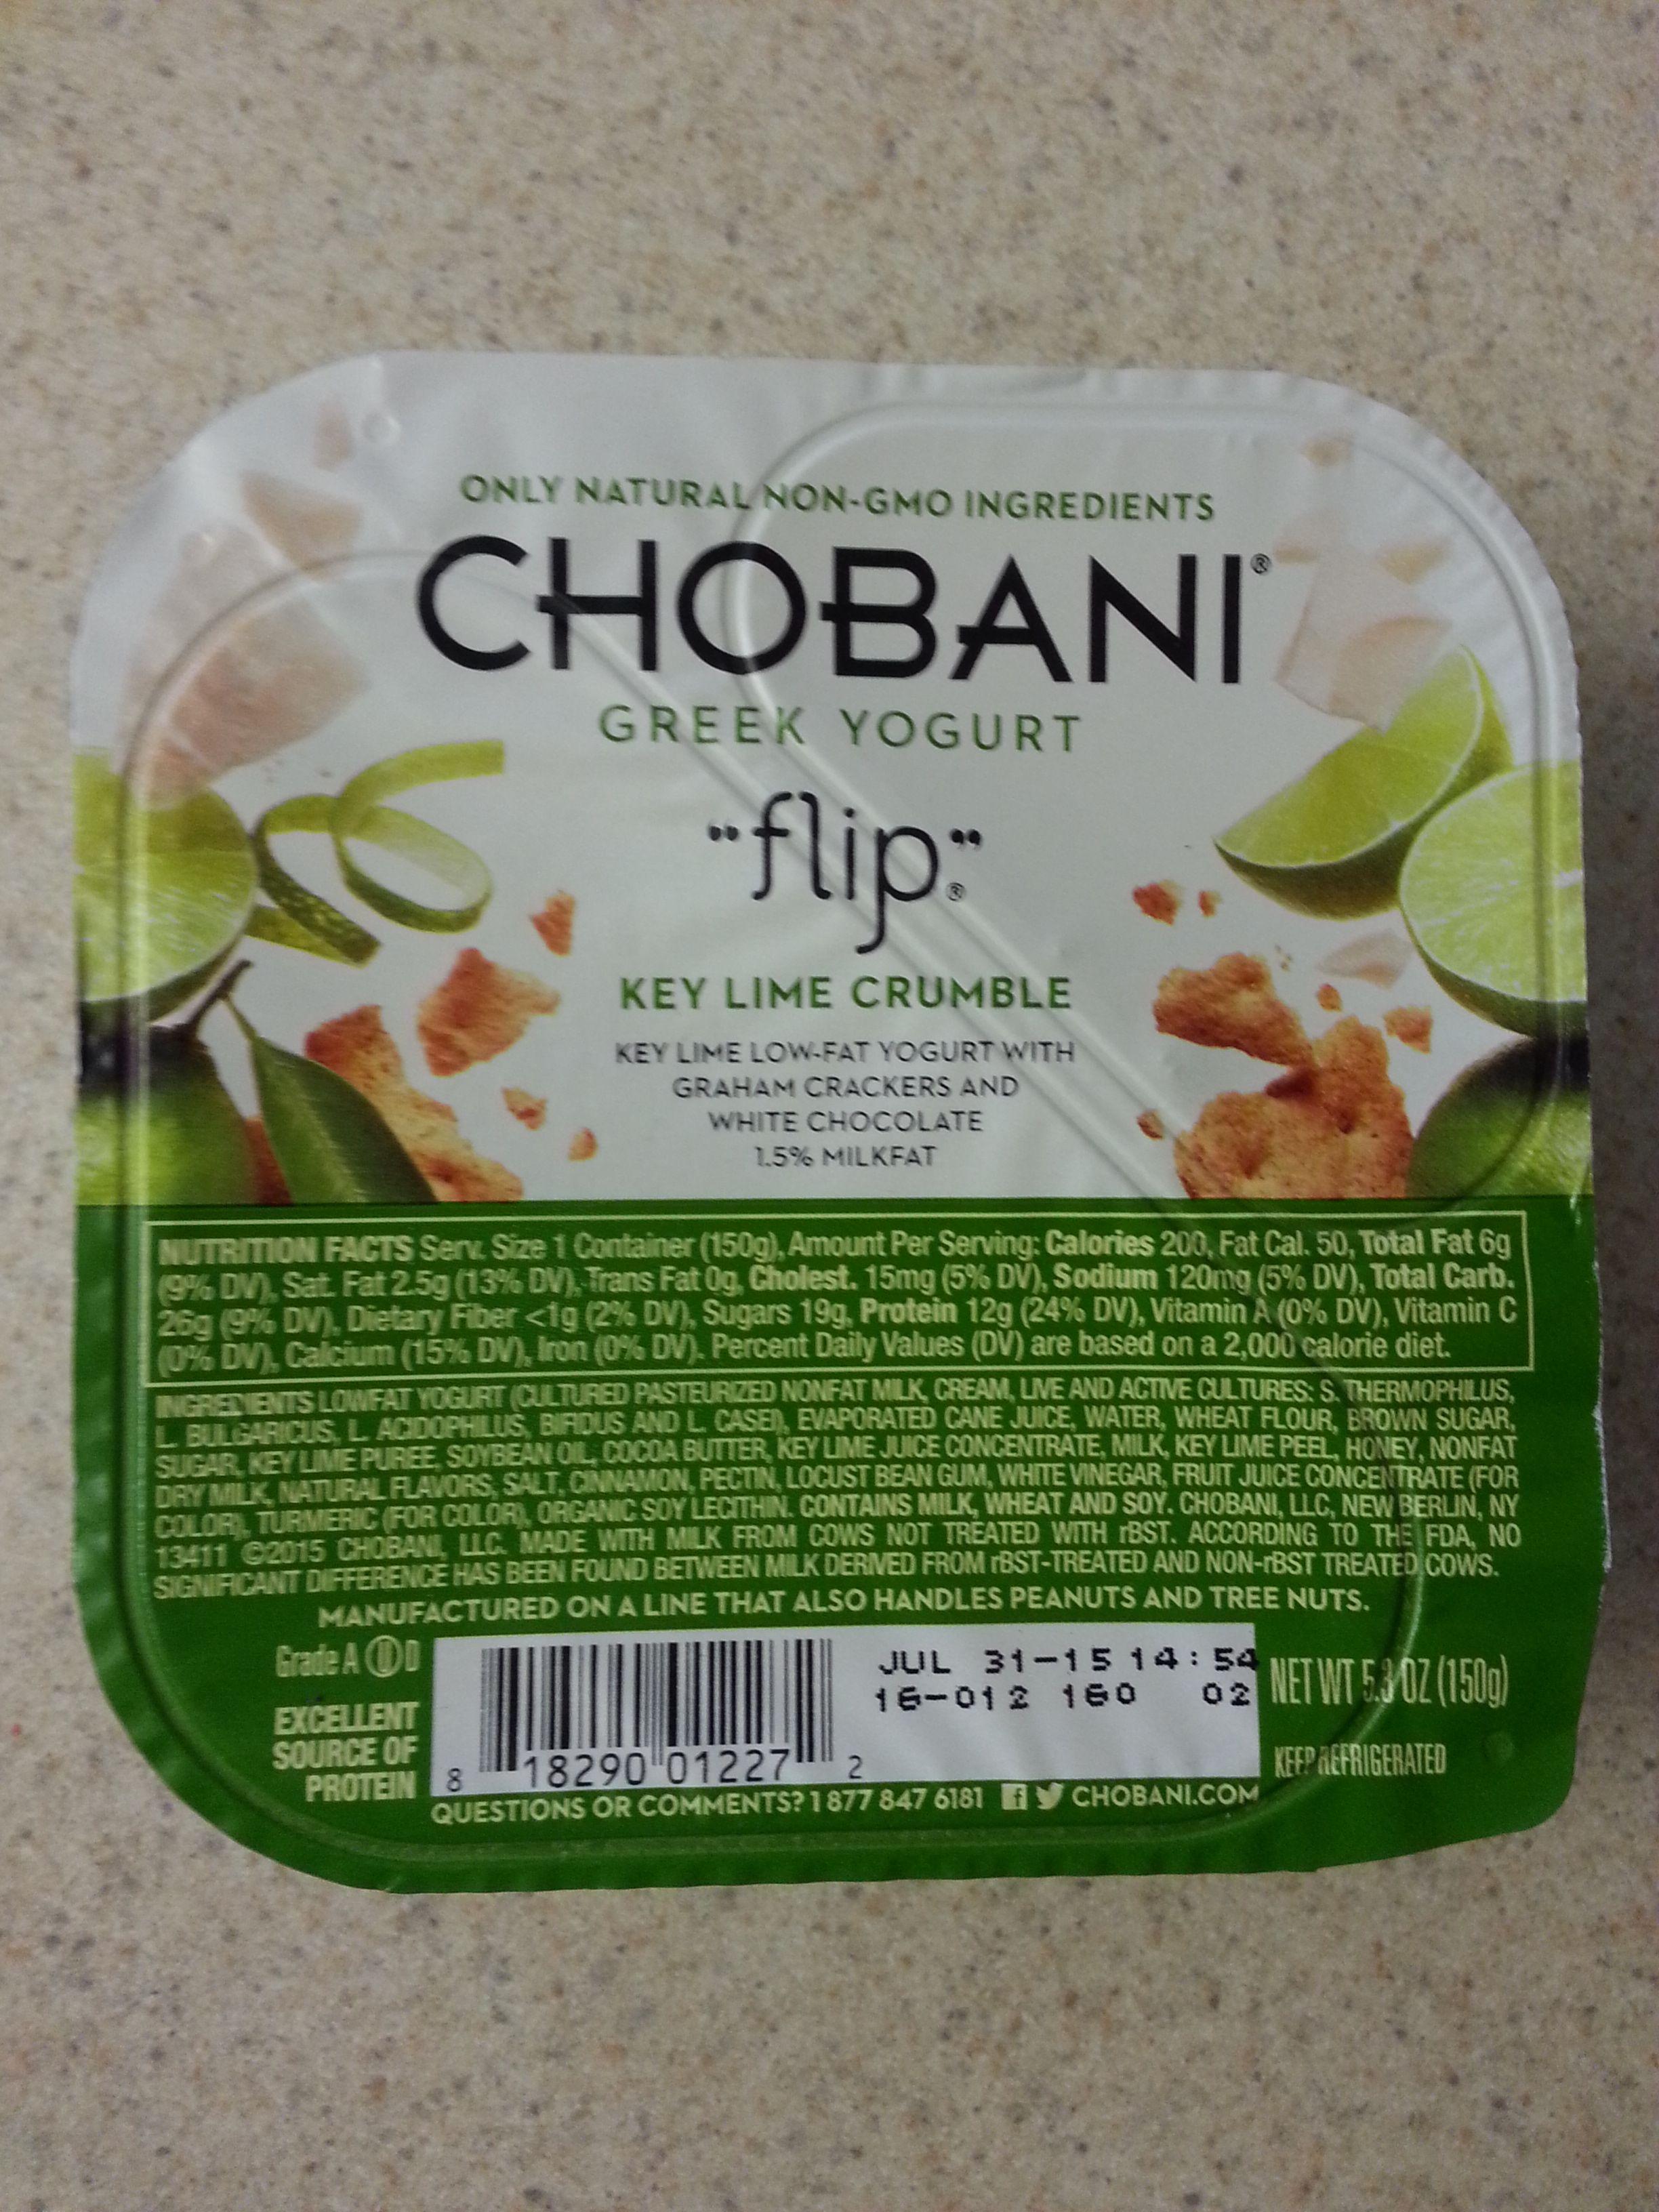 Chobani Flip Key Lime Crumble is my new go-to late night ...